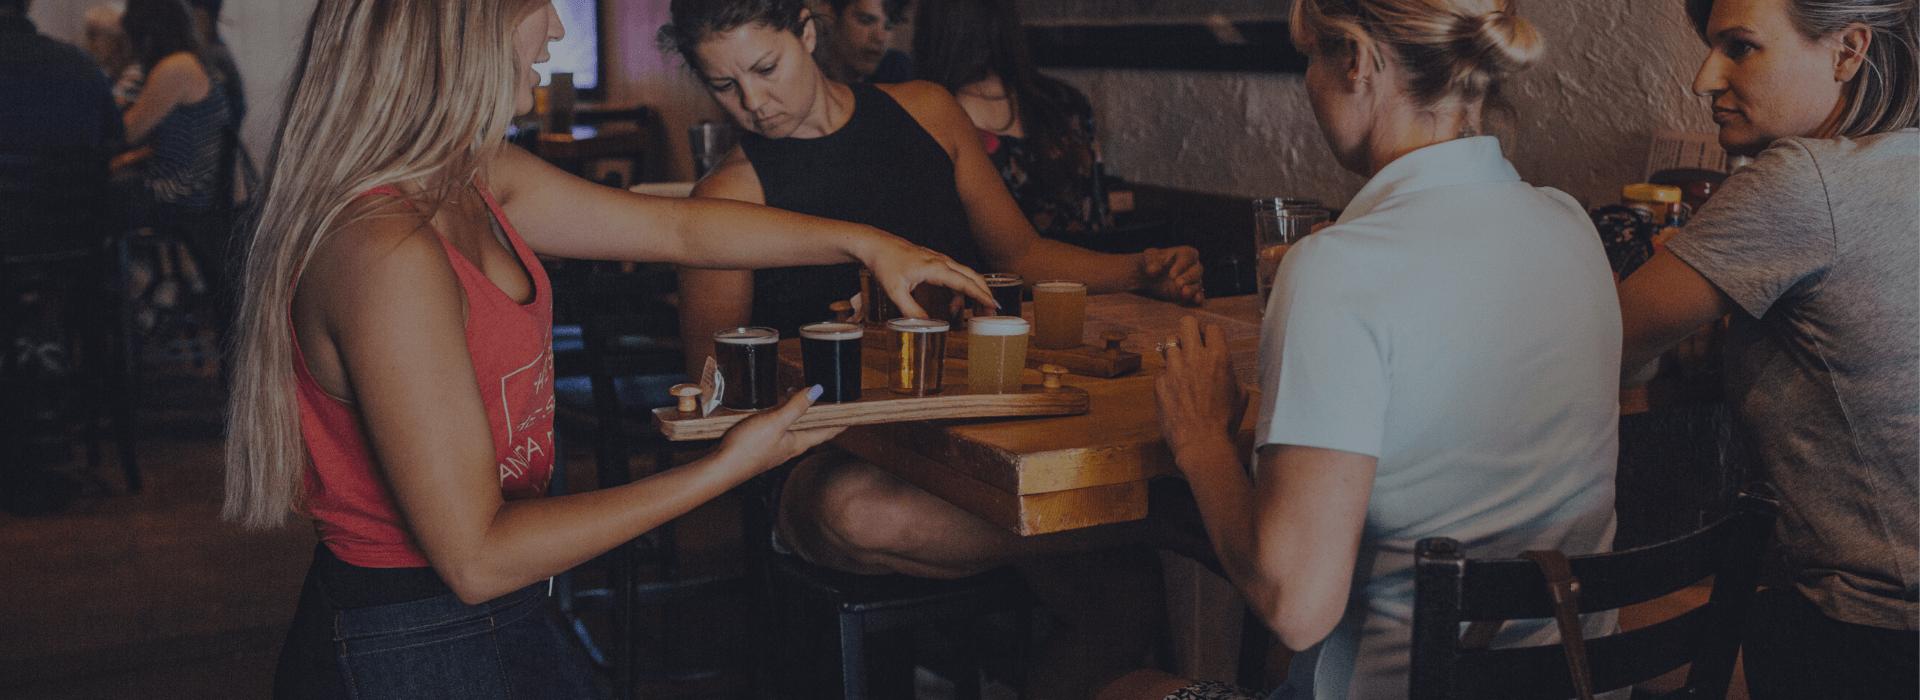 Waiter serving beer